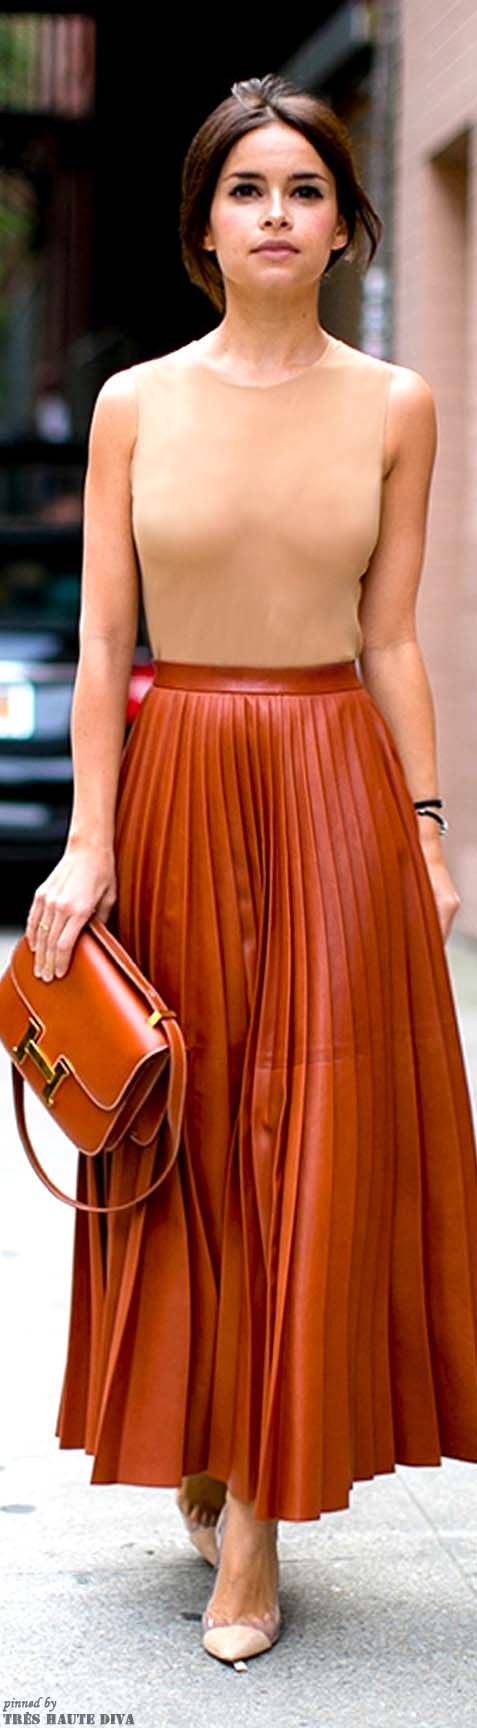 Miroslava duma falda midi piel marrón